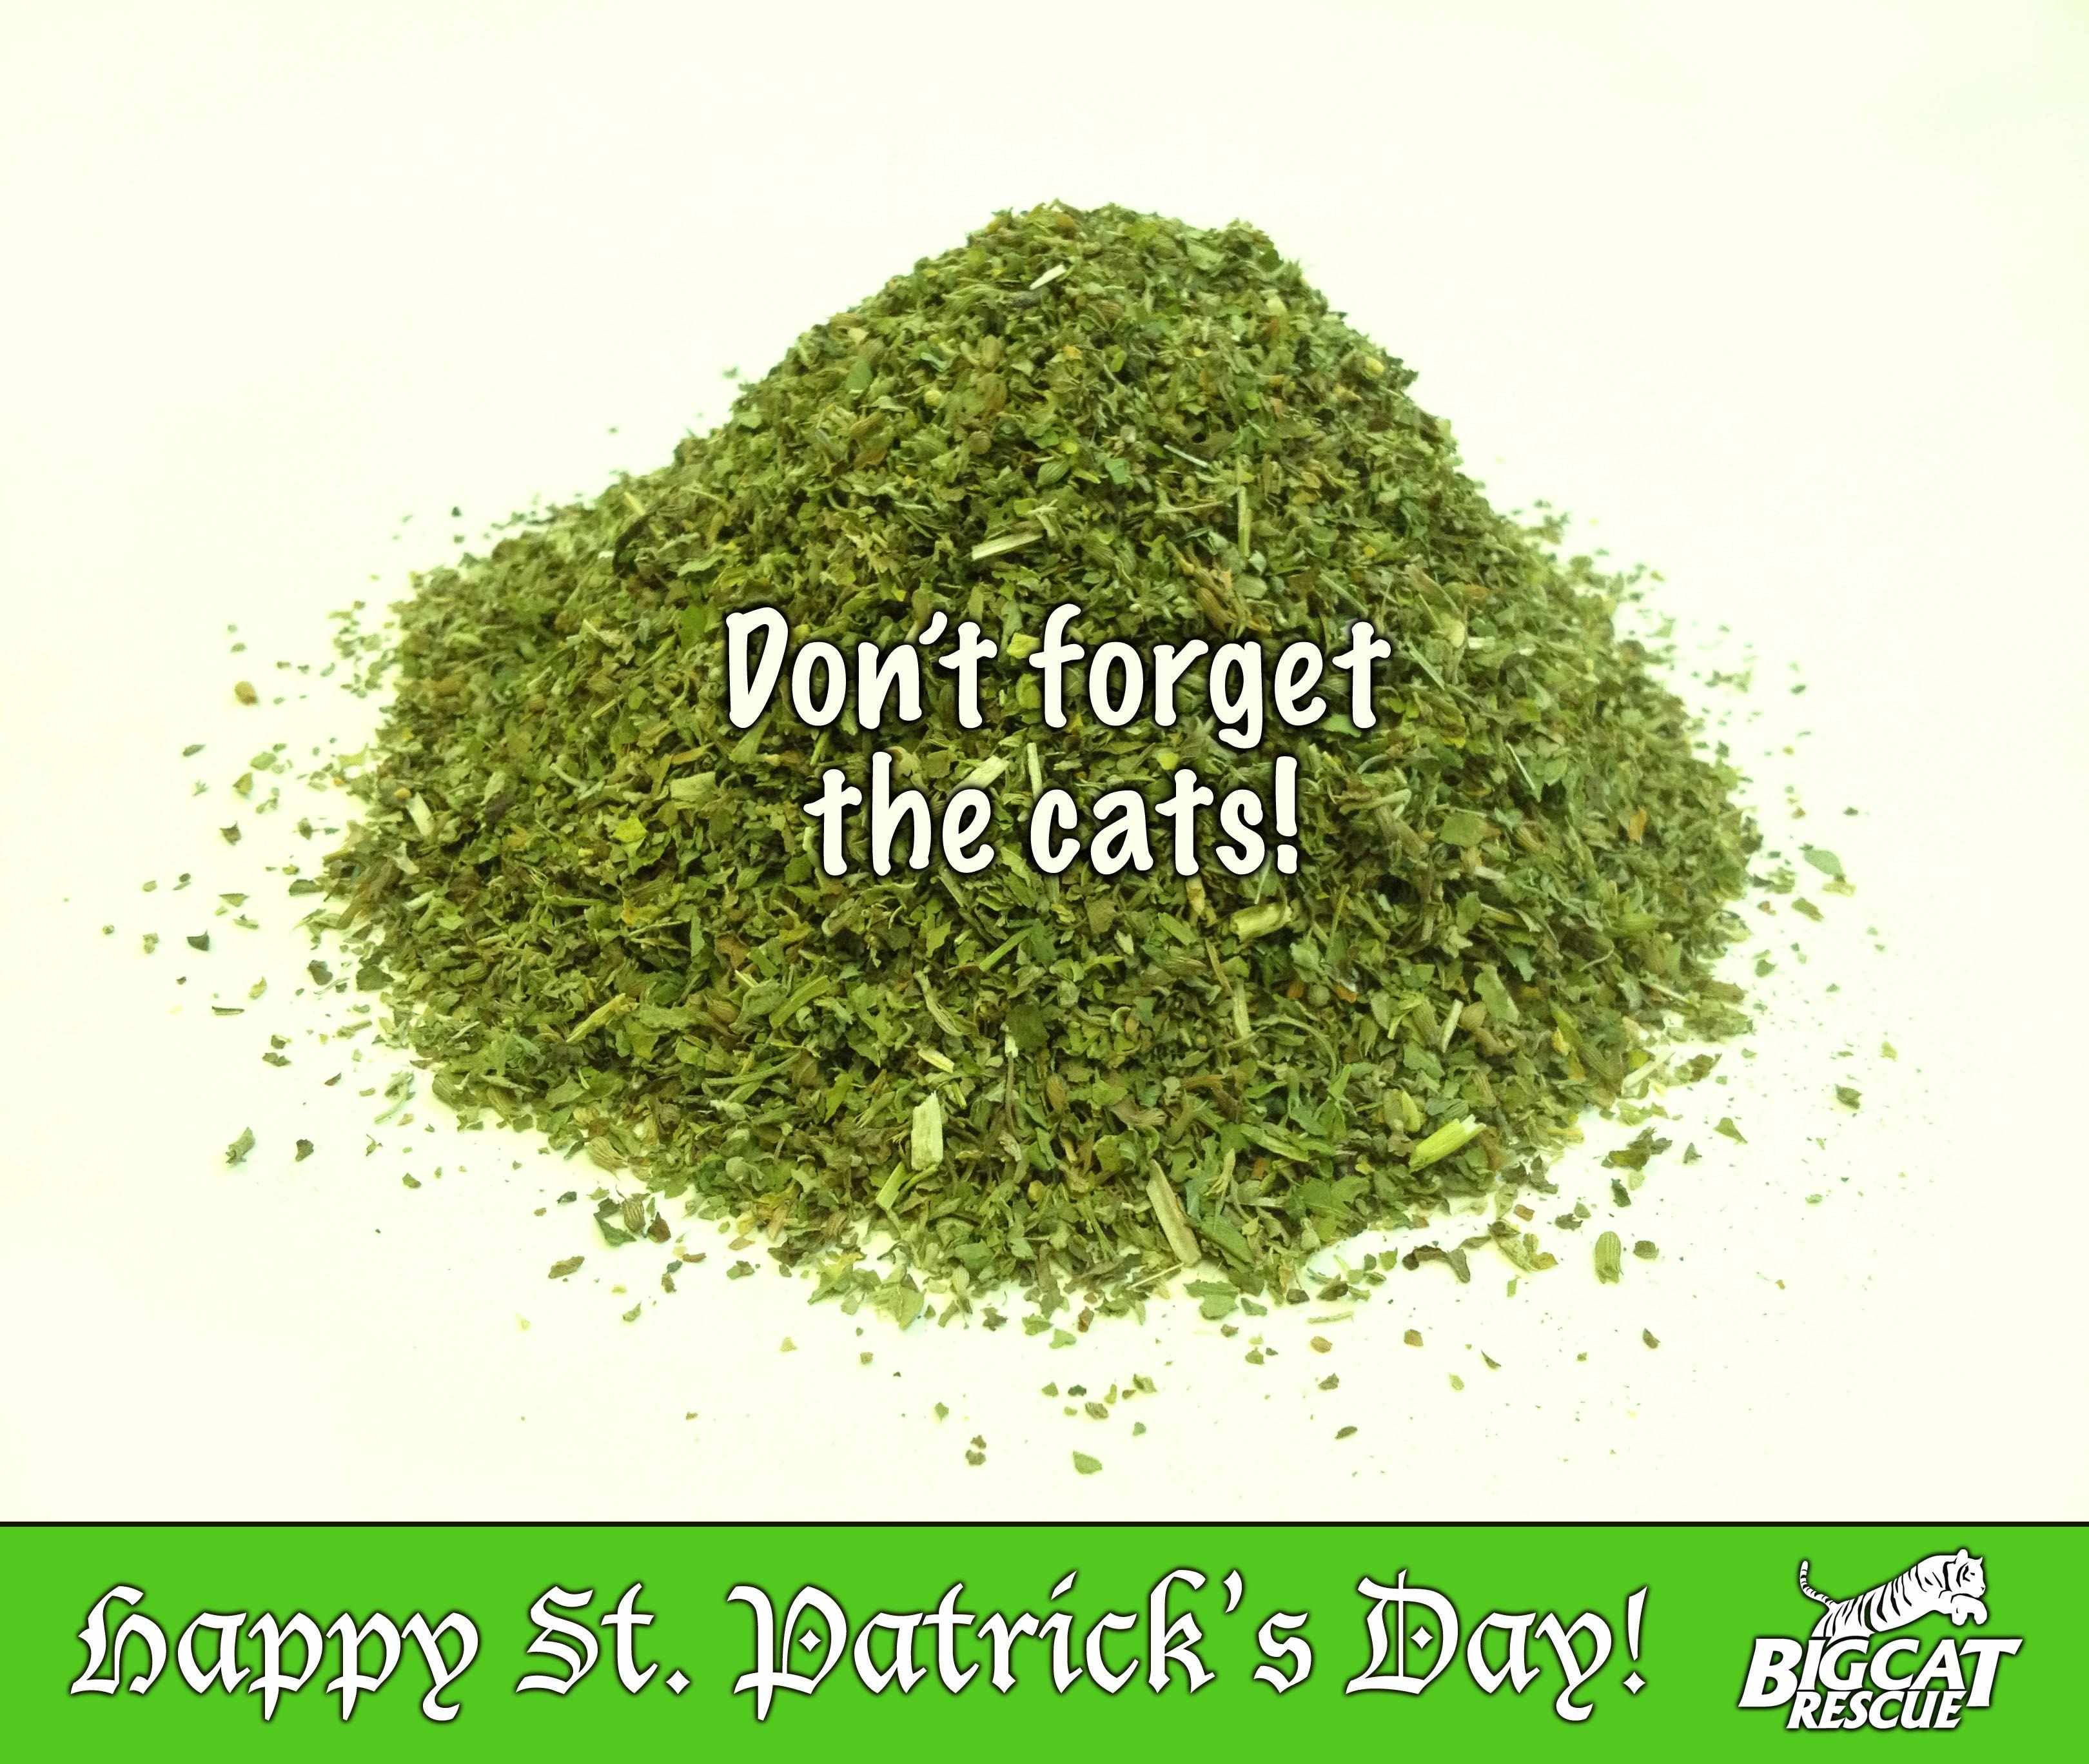 HAPPY ST. PATRICK'S DAY! *Do your cats like catnip